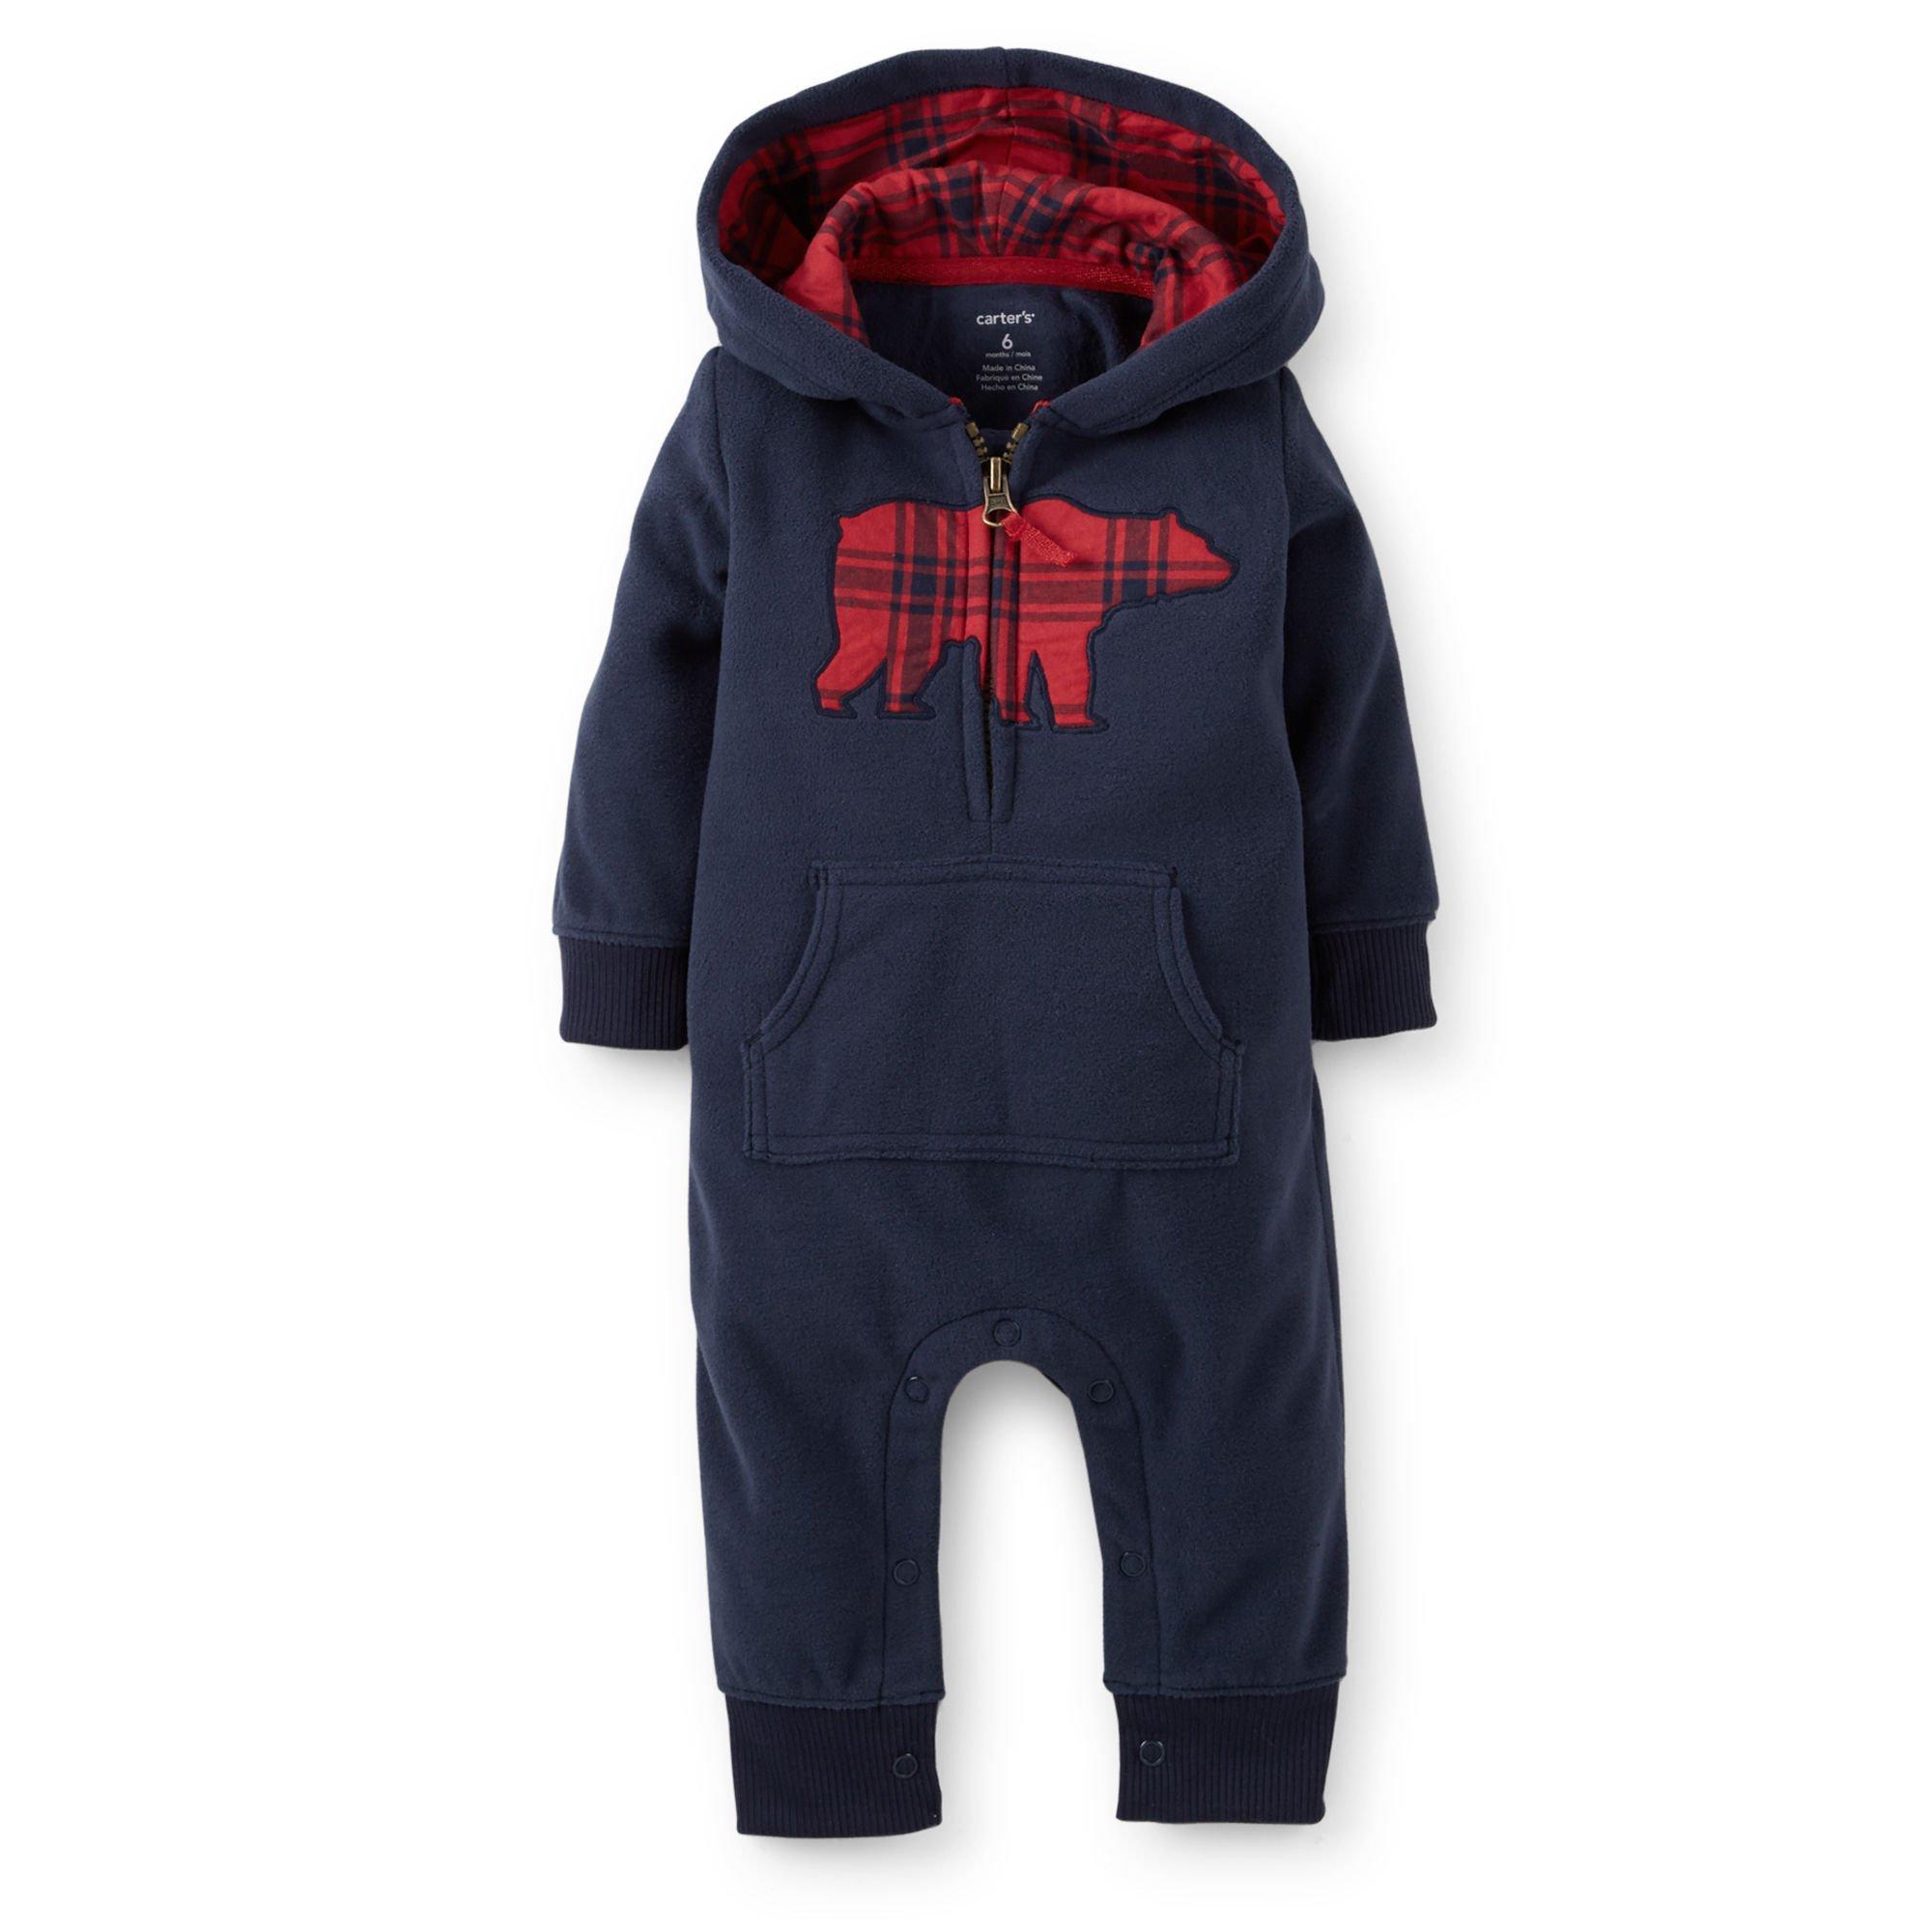 Carter's Baby Boys' Appliqué Hooded Fleece Jumpsuit (9 Months, Navy Bear)